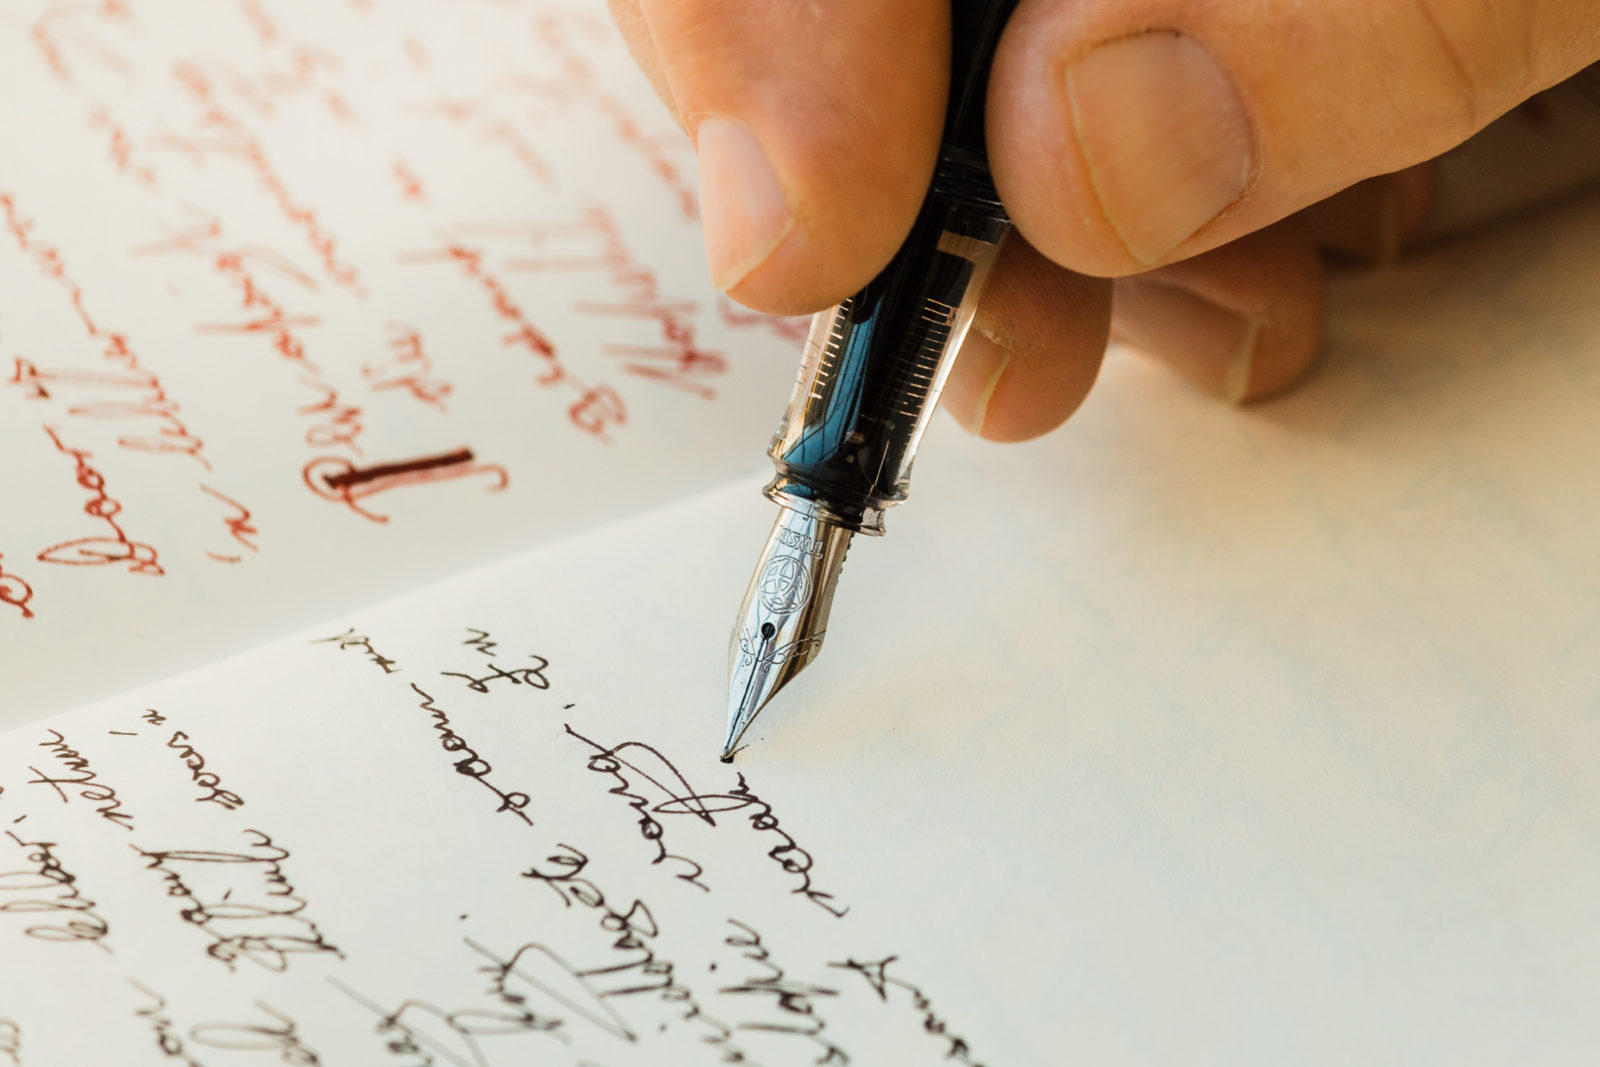 Ziets Writing Stuff Down